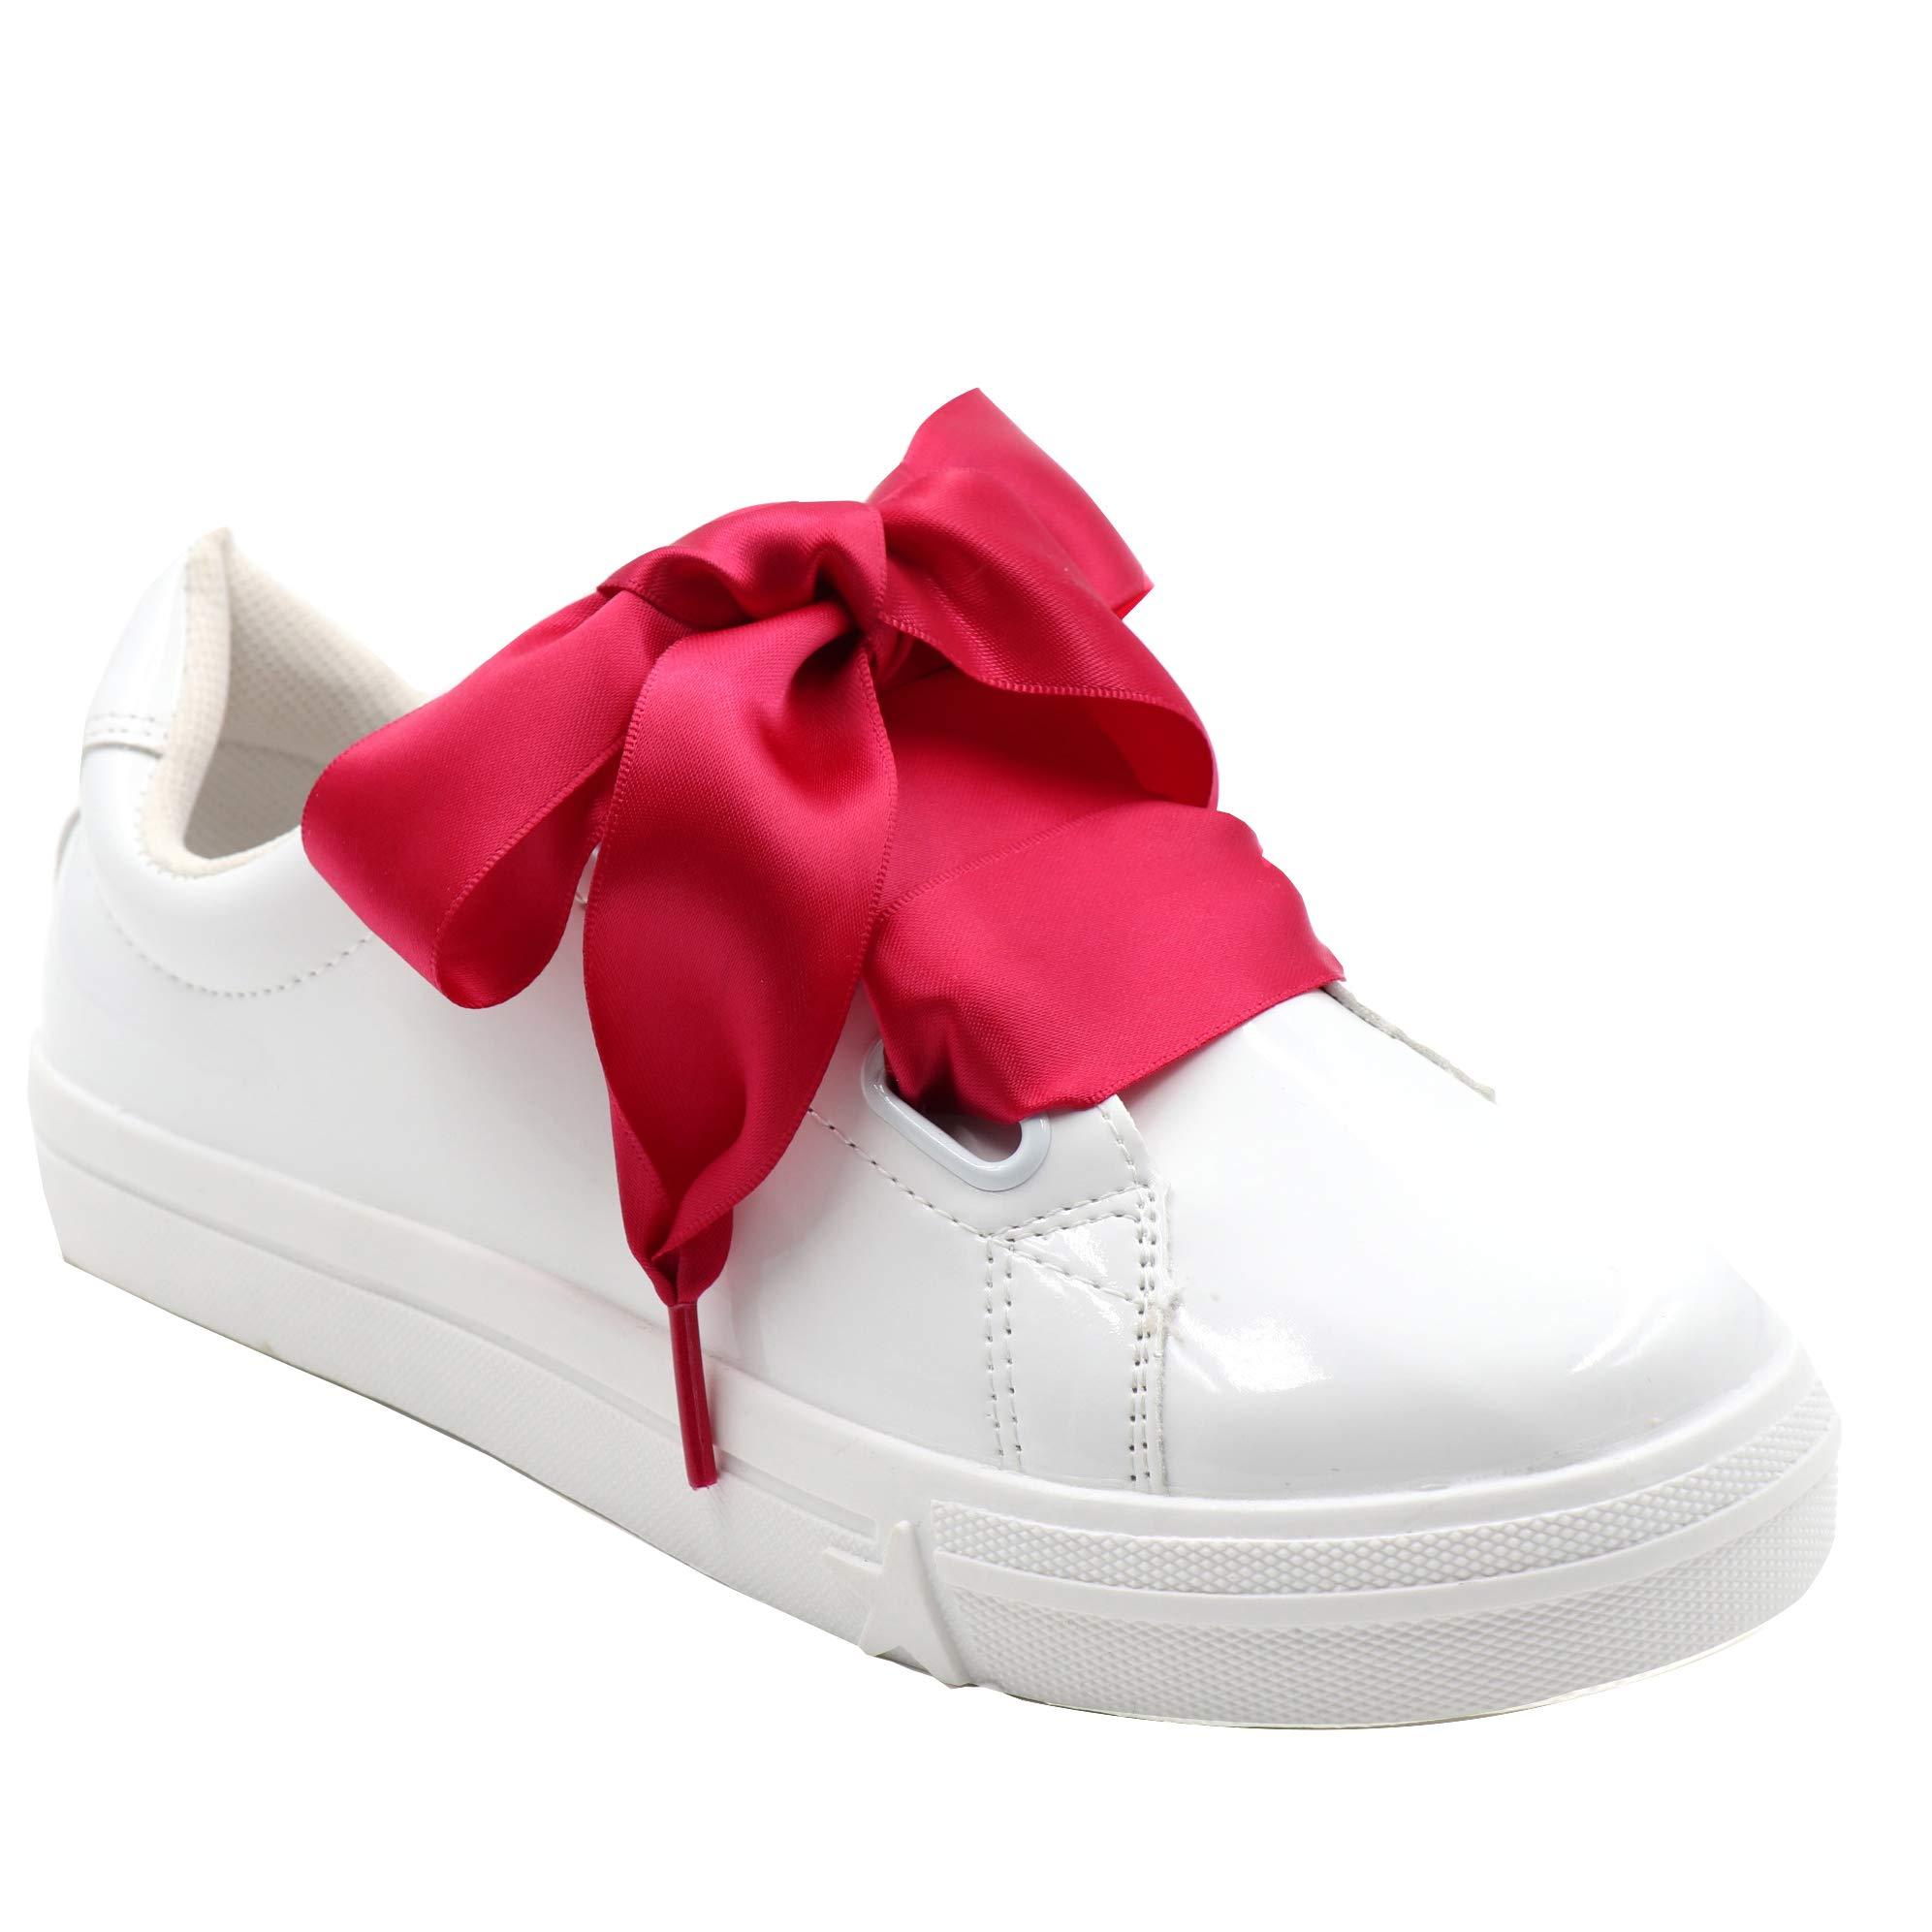 COOL LACE Satin Ribbon Shoelaces Flat